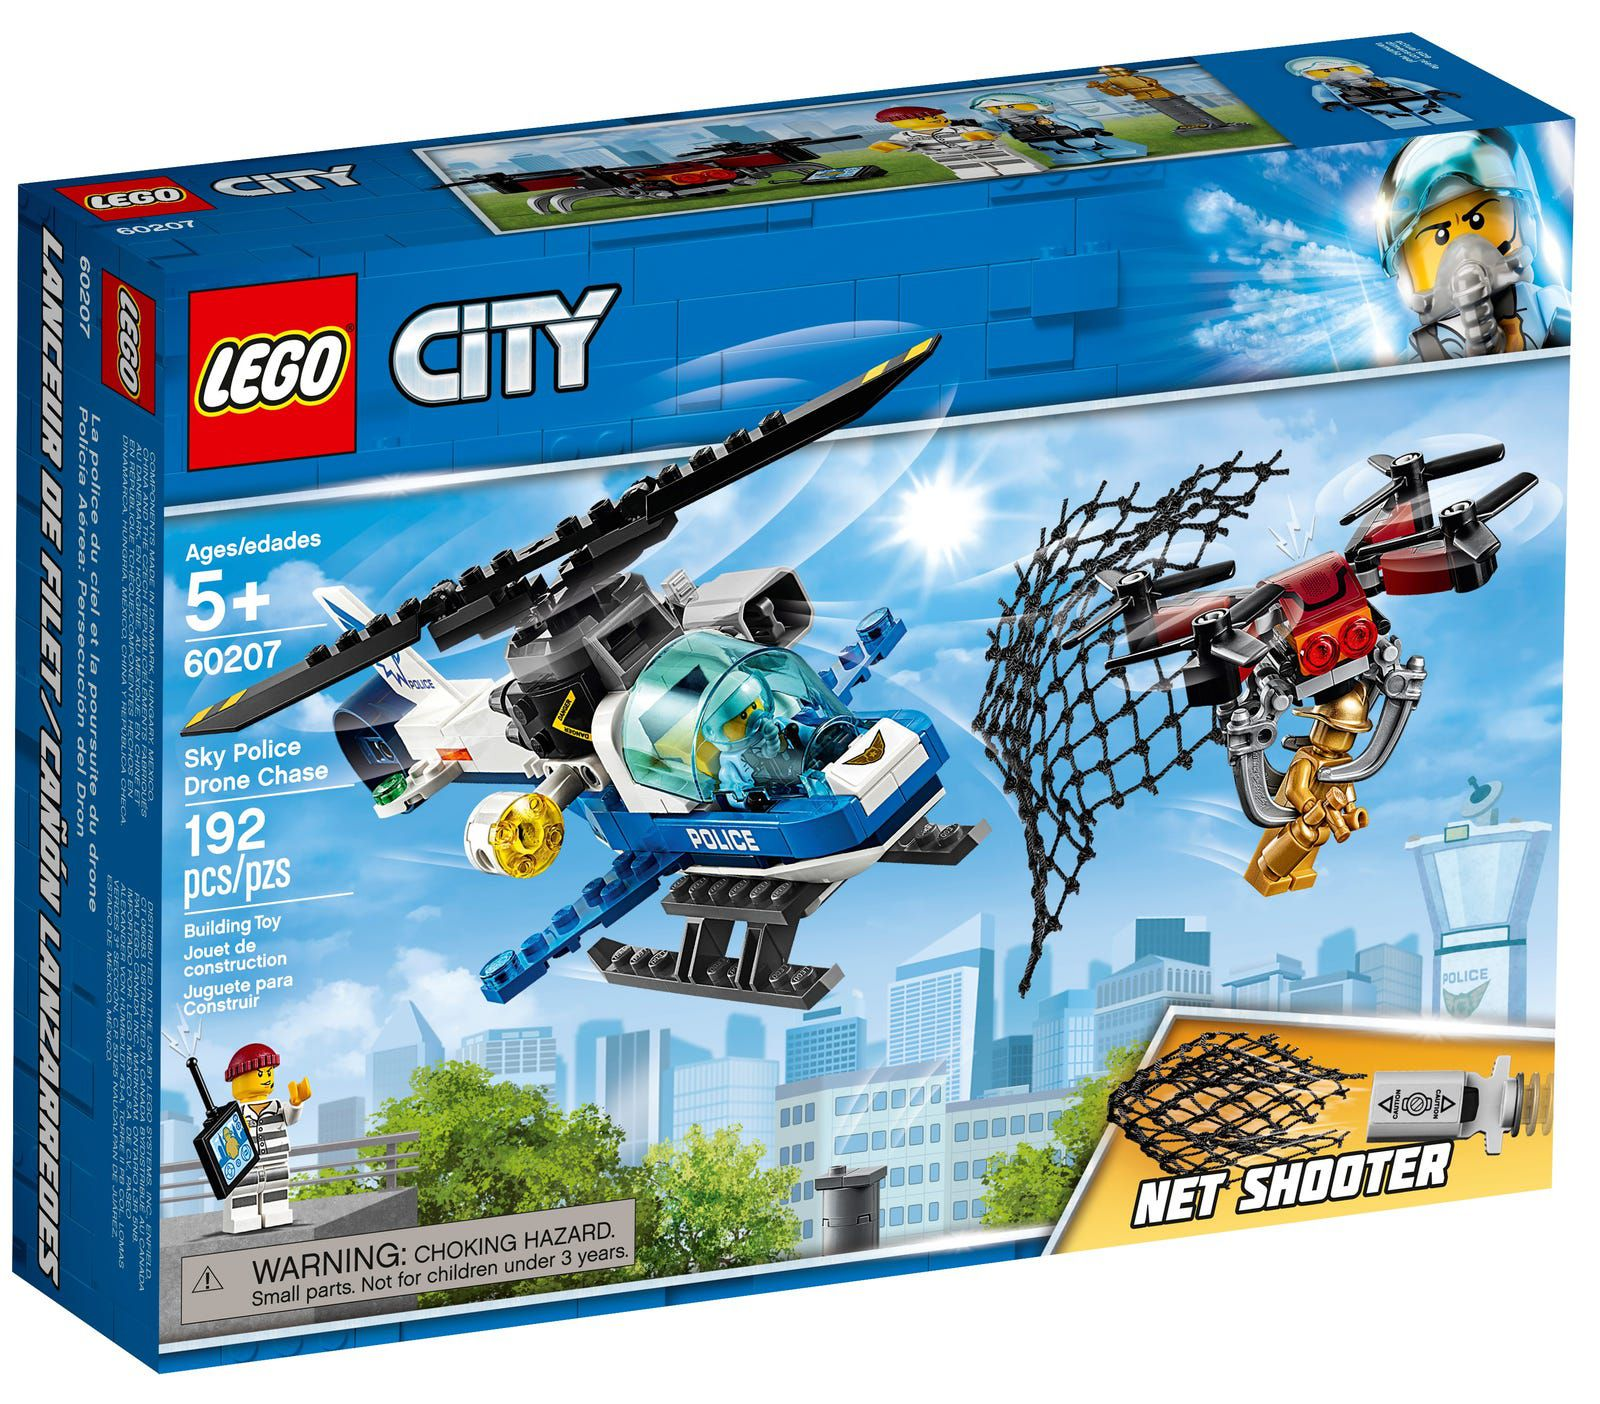 lego city neuheiten 2019